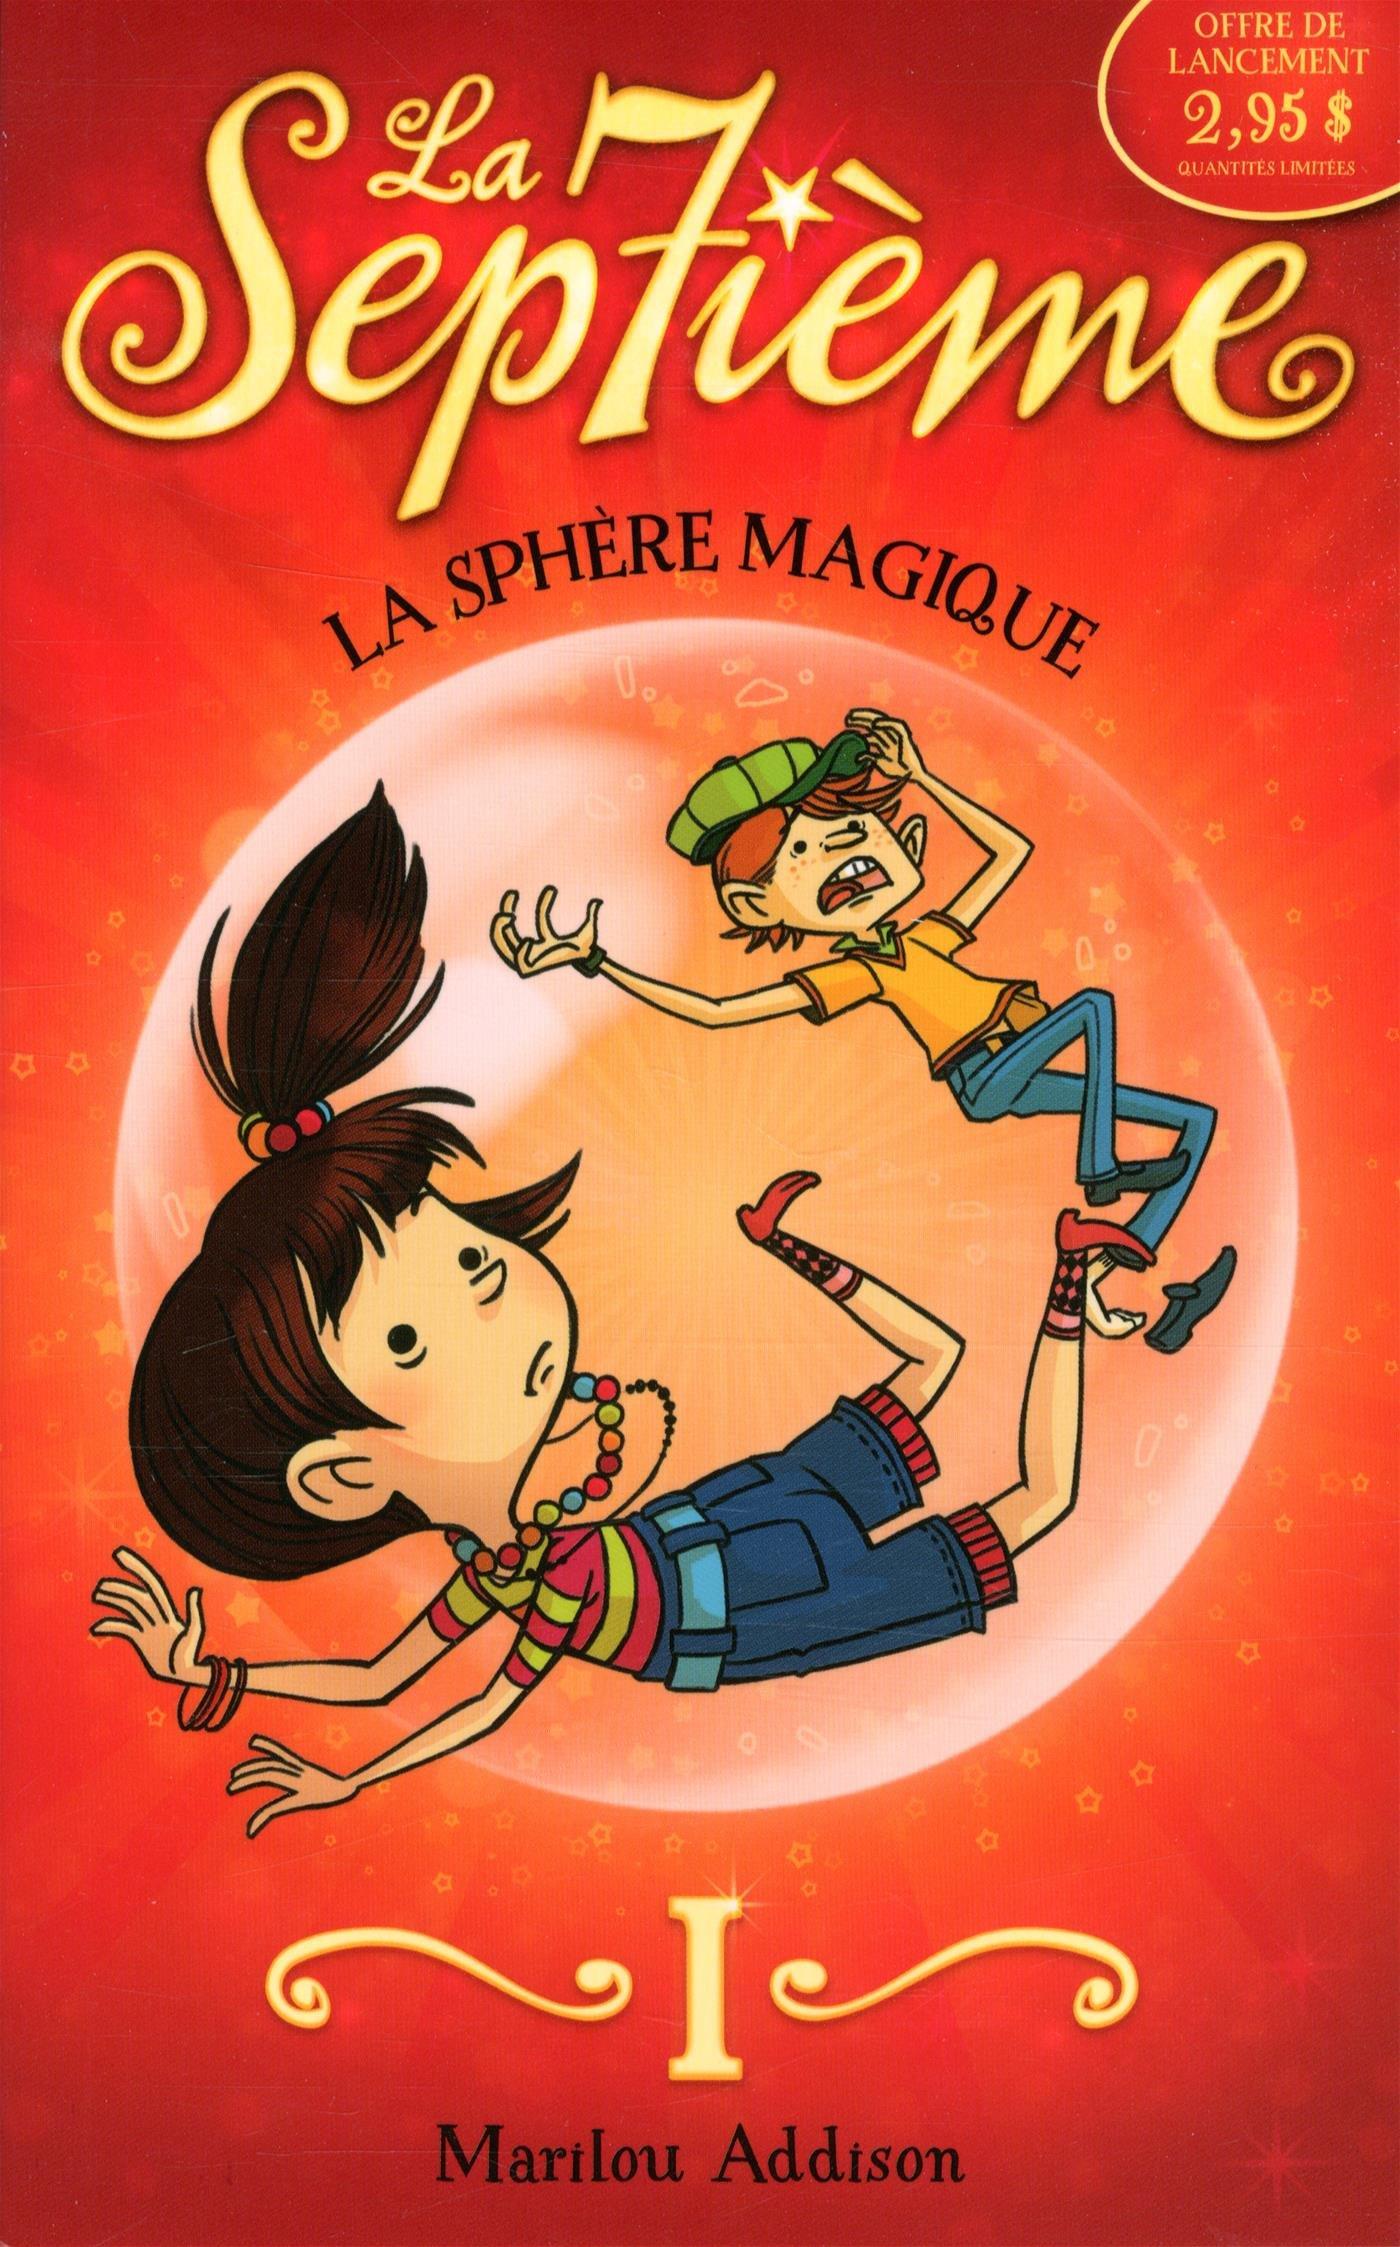 La sphère magique - I